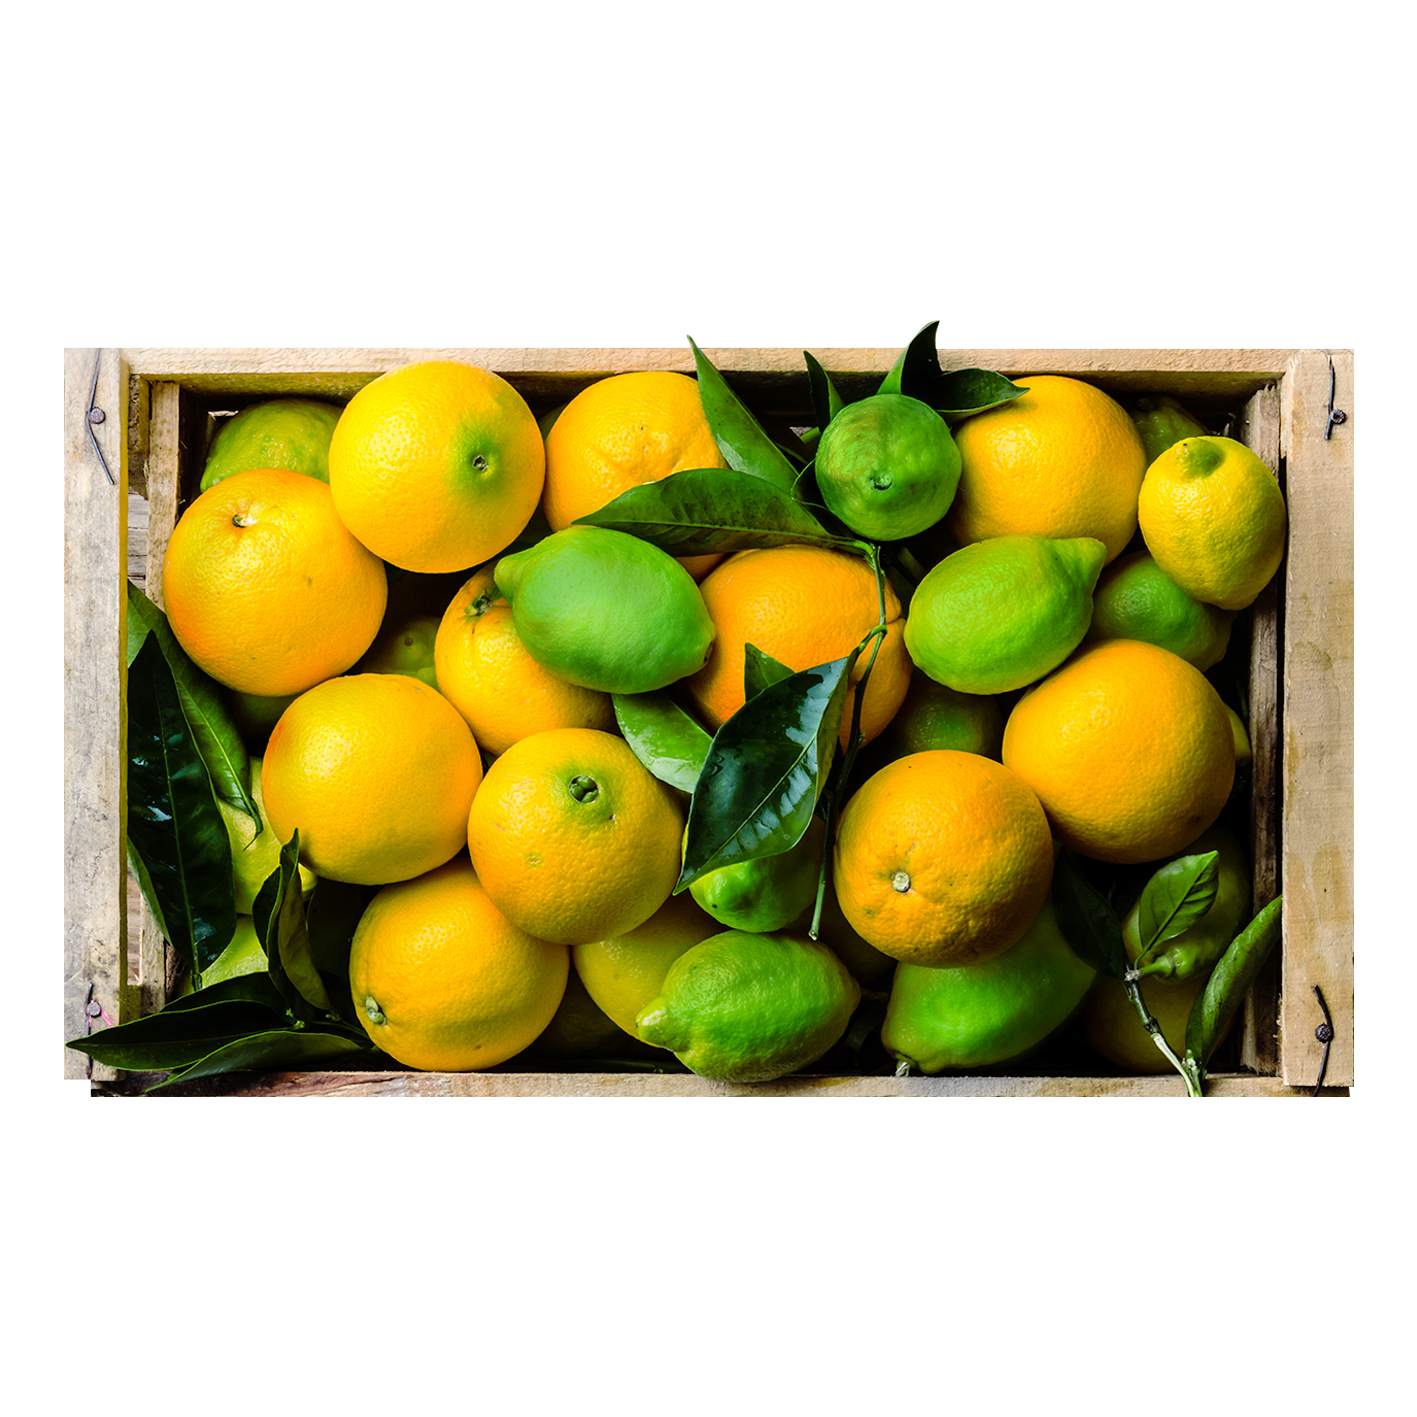 Naranja Salustiana - Limón Tahiti ( 20 Kg Naranja/ 3Kg Limón)